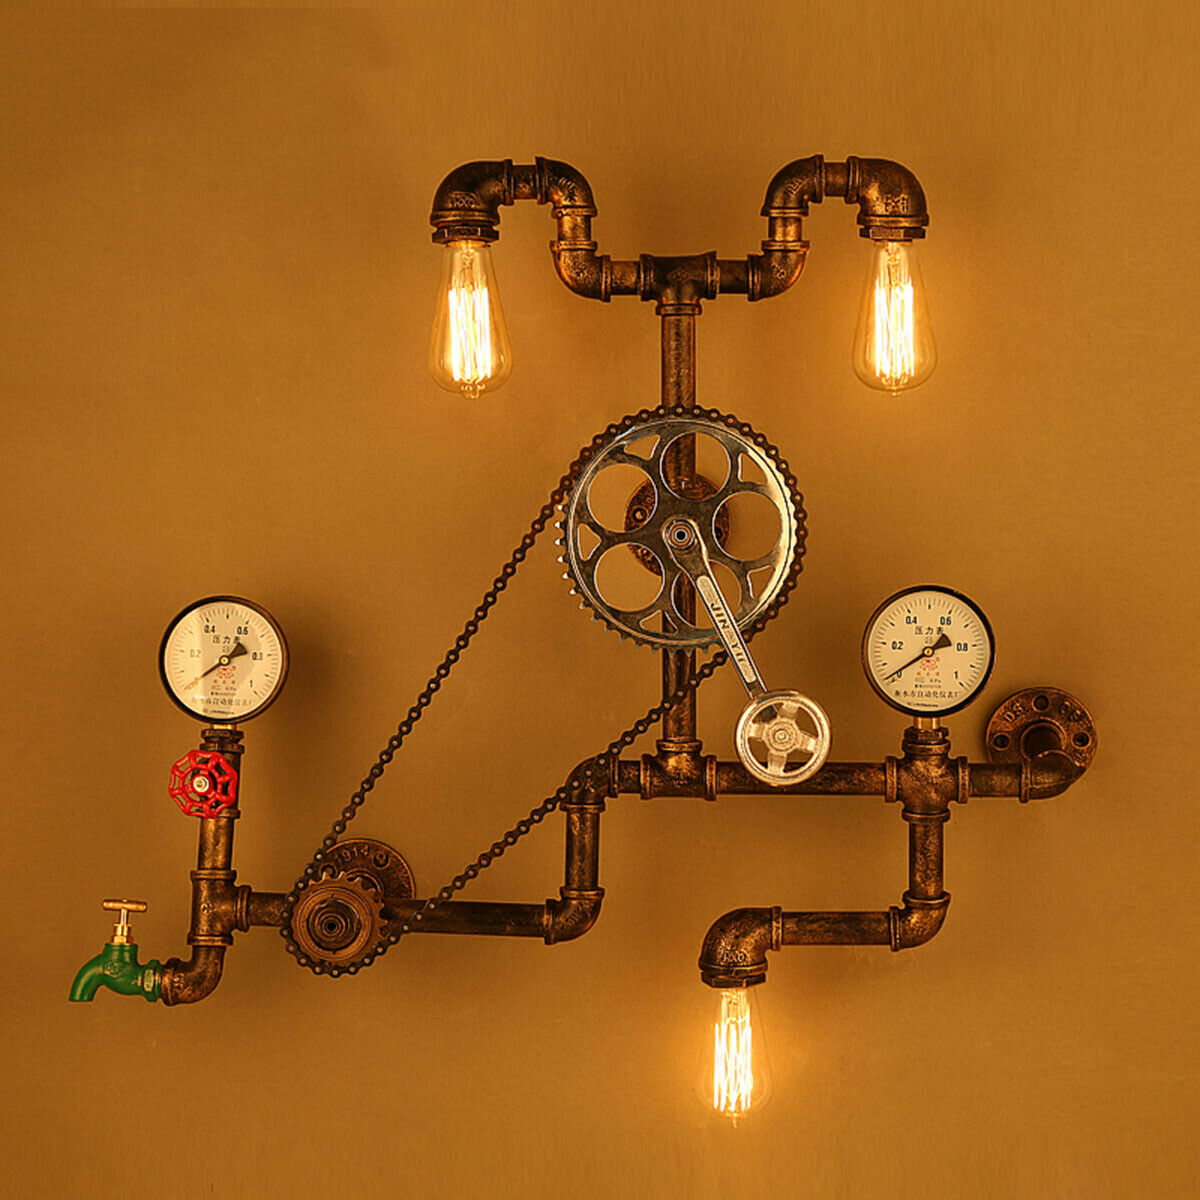 Industrial Retro Iron Pipe Wall Lamp Bike Chain Loft Light Gauge Switch Water